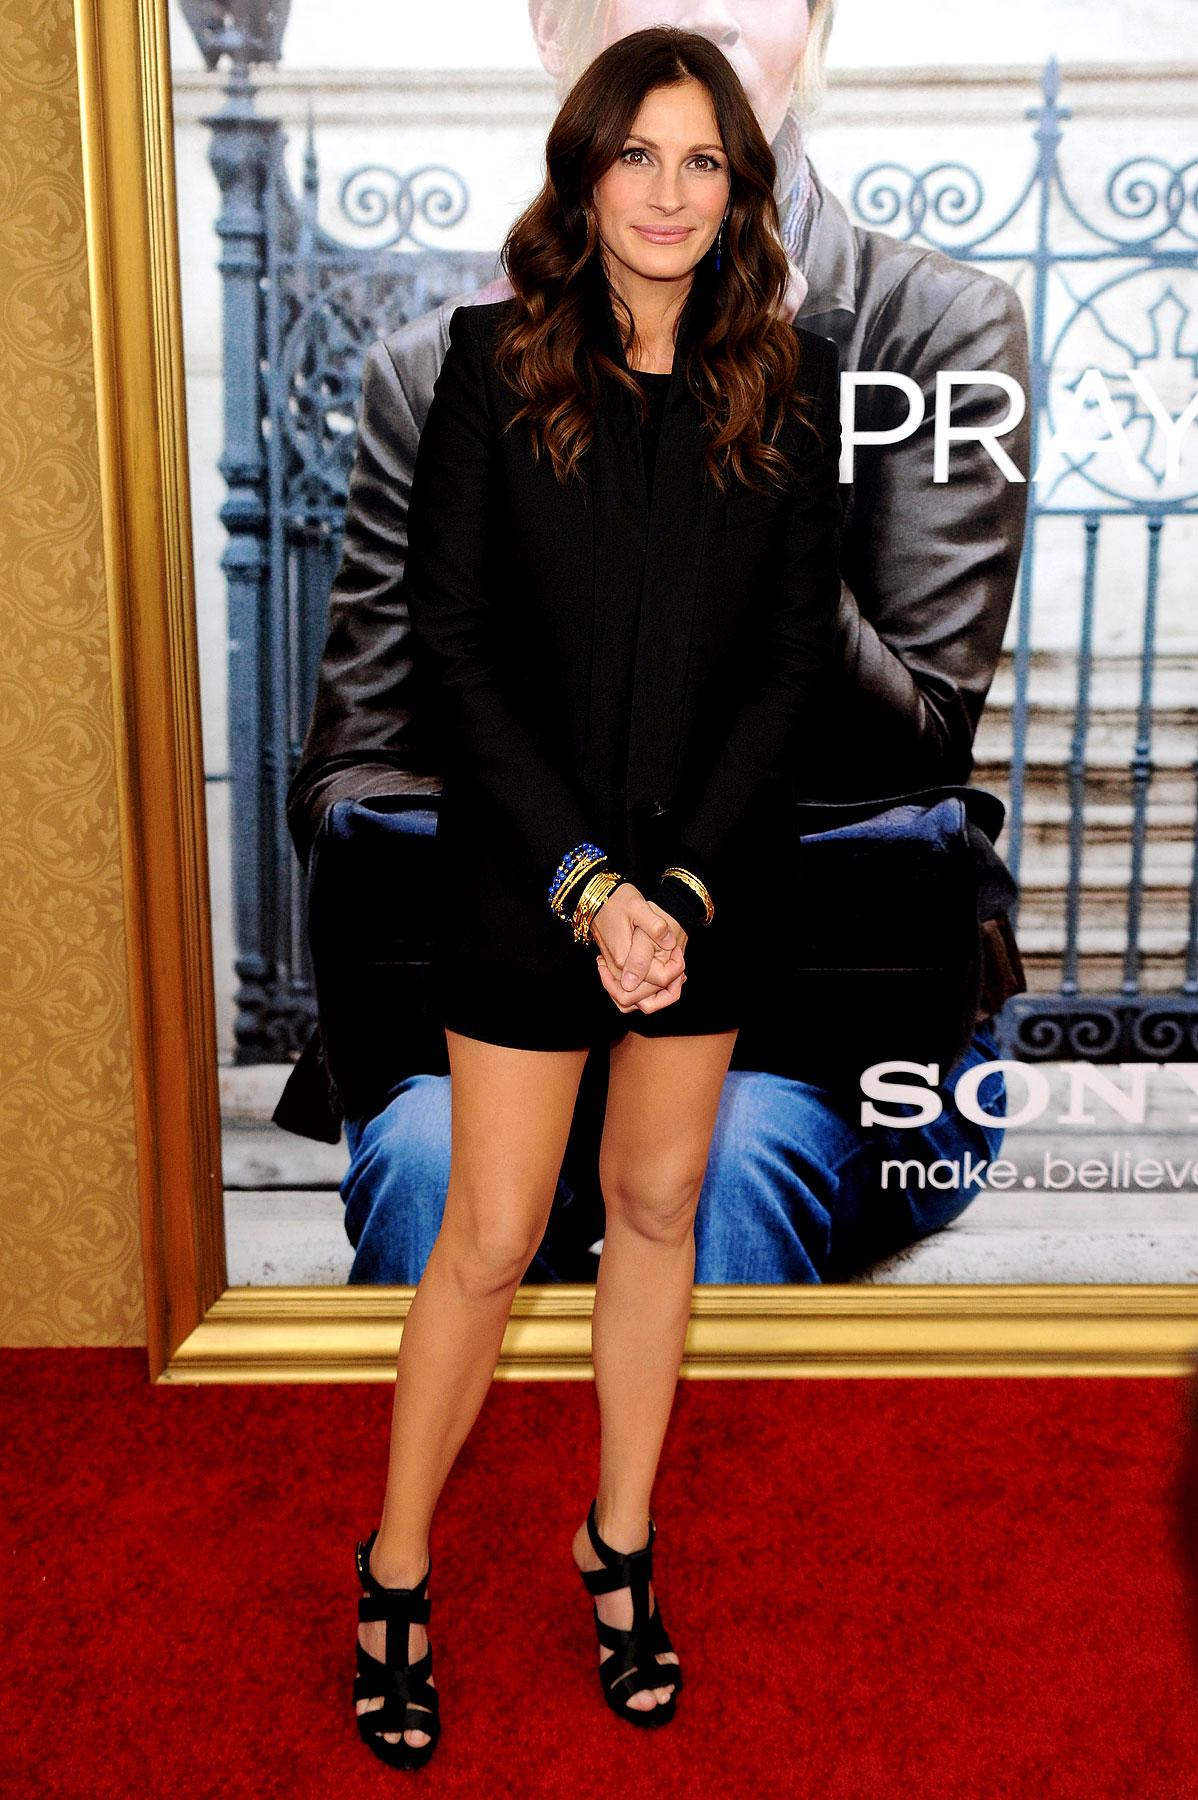 Julia Roberts Premieres 'Eat Pray Love' (PHOTOS)